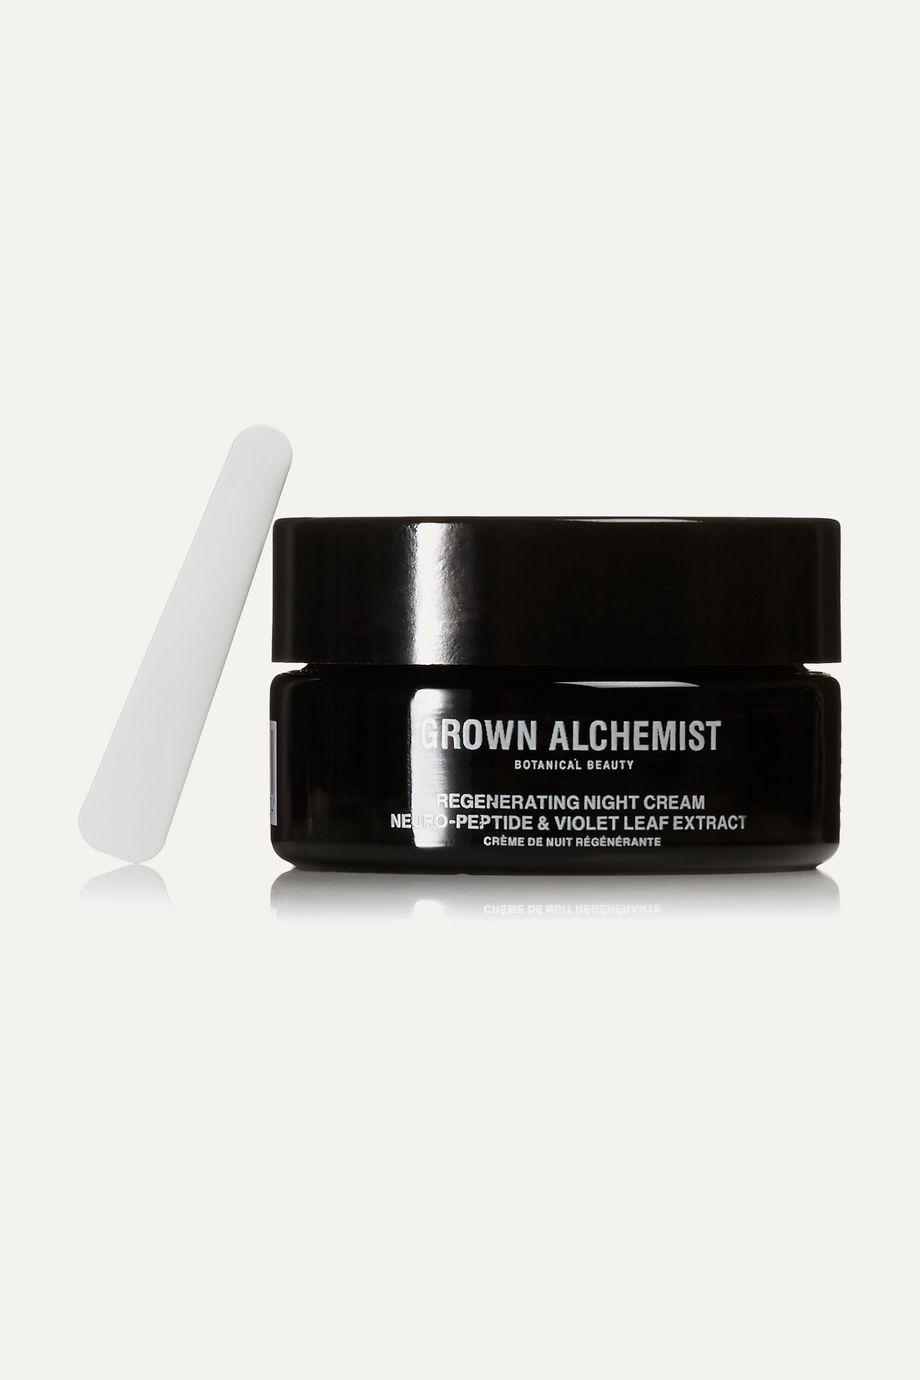 Grown Alchemist Regenerating Night Cream, 40 ml – Nachtcreme